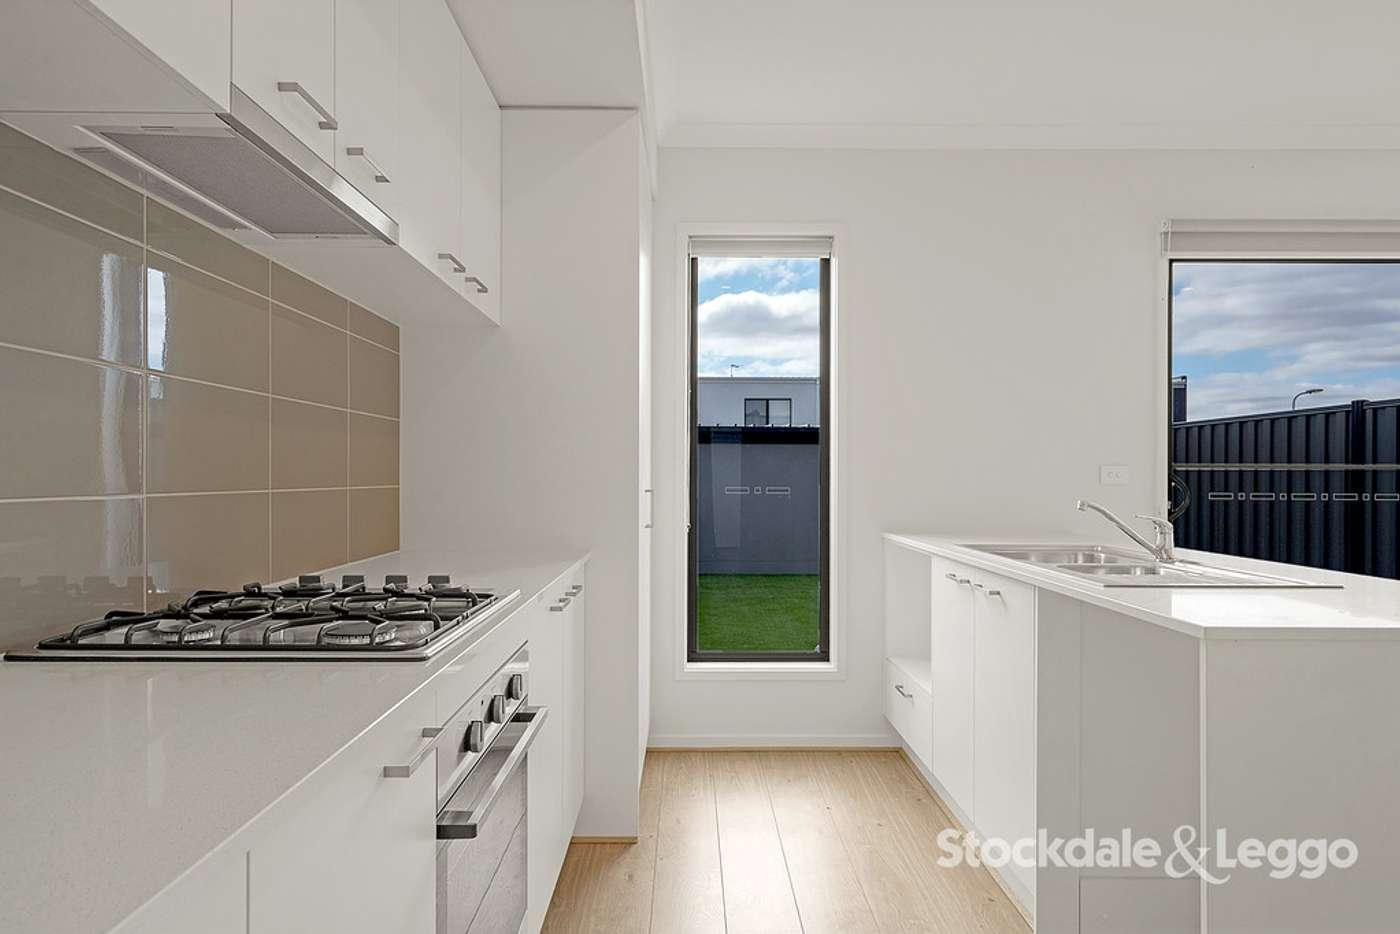 Sixth view of Homely house listing, 118 Highlander Drive, Craigieburn VIC 3064